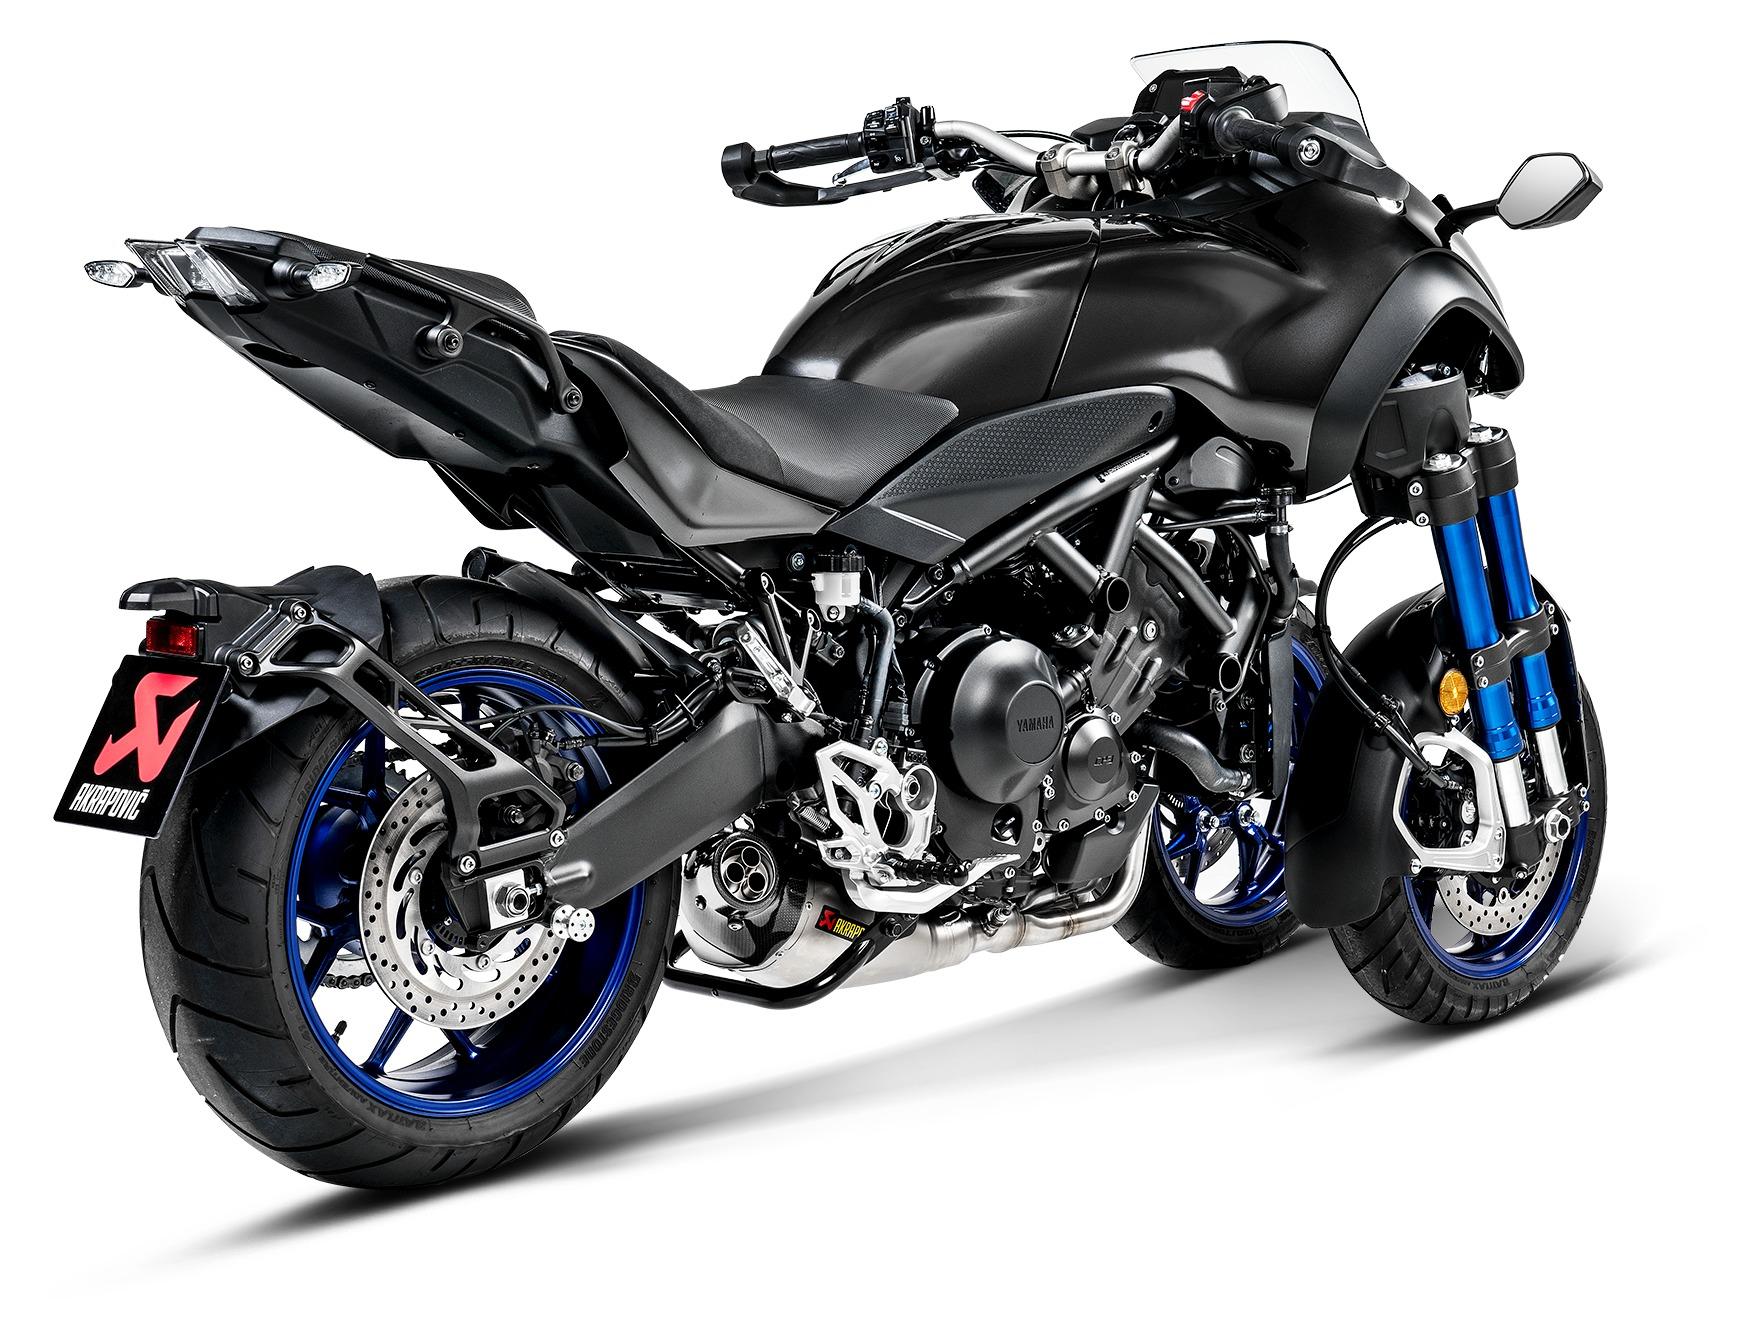 Akrapovic Racing Exhaust System Yamaha Niken 2019 10 12600